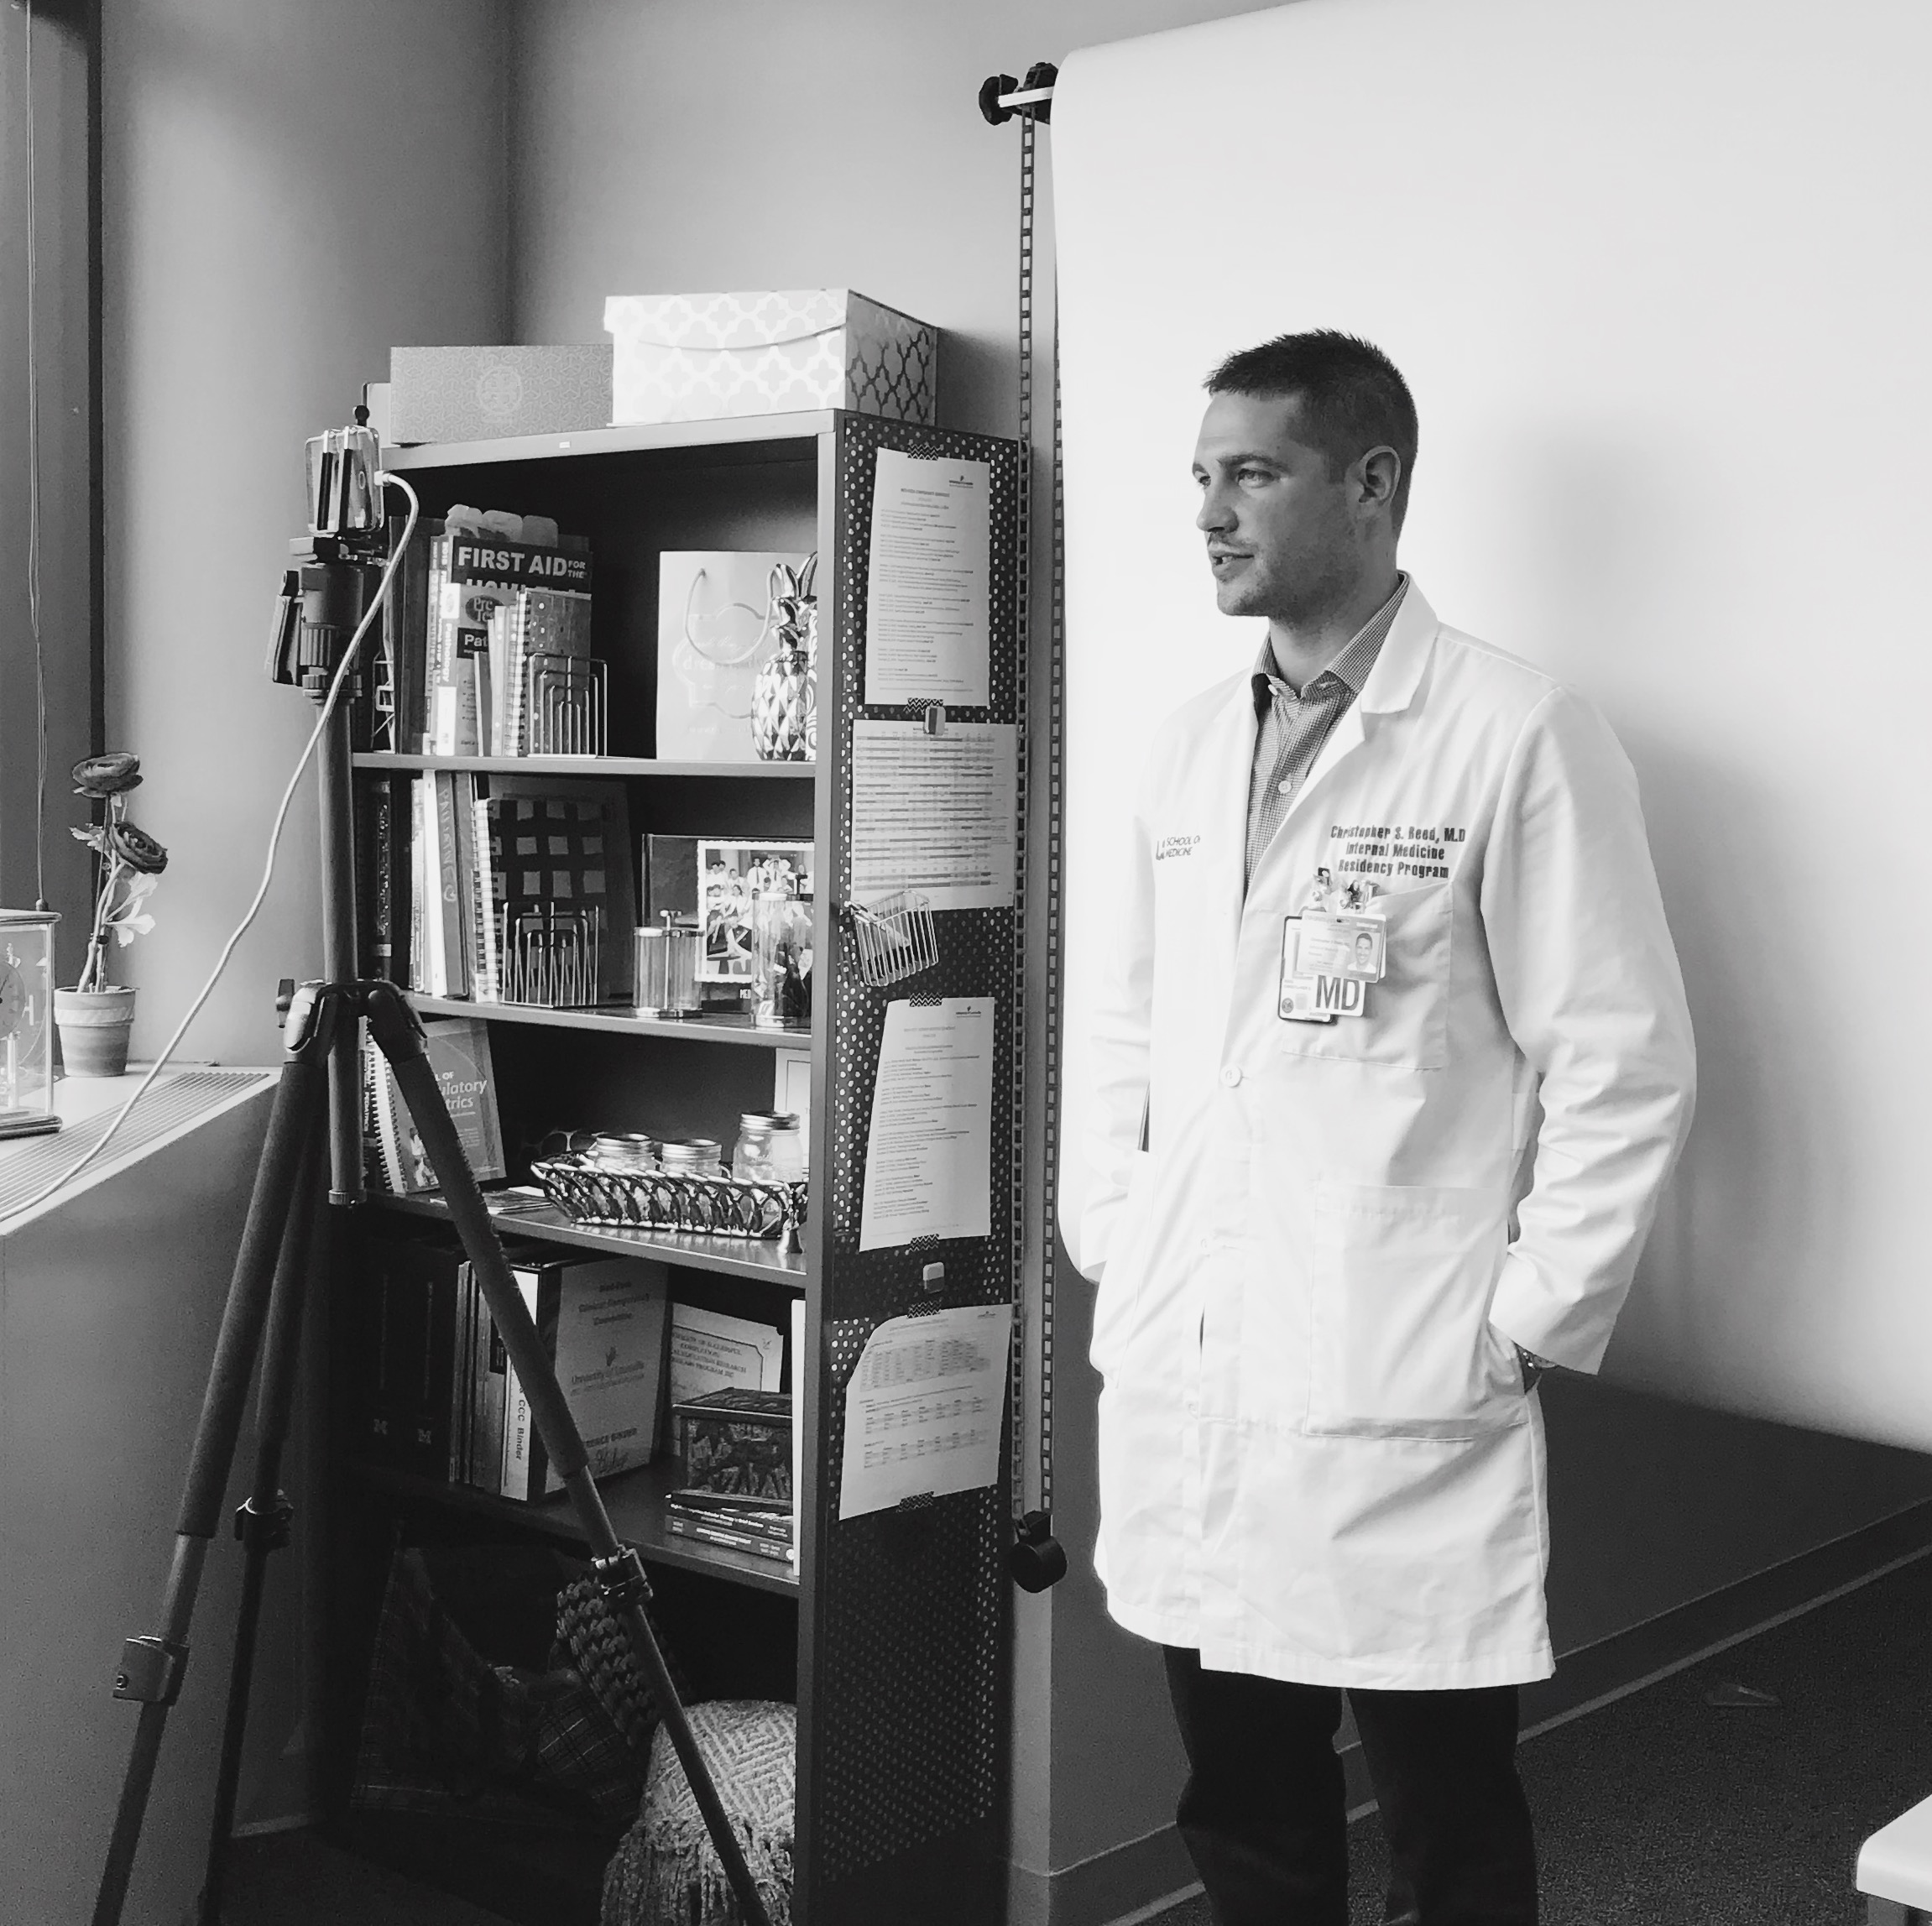 Dr. Christopher Reed - PGY 2 University of Louisville Internal Medicine Residency Program